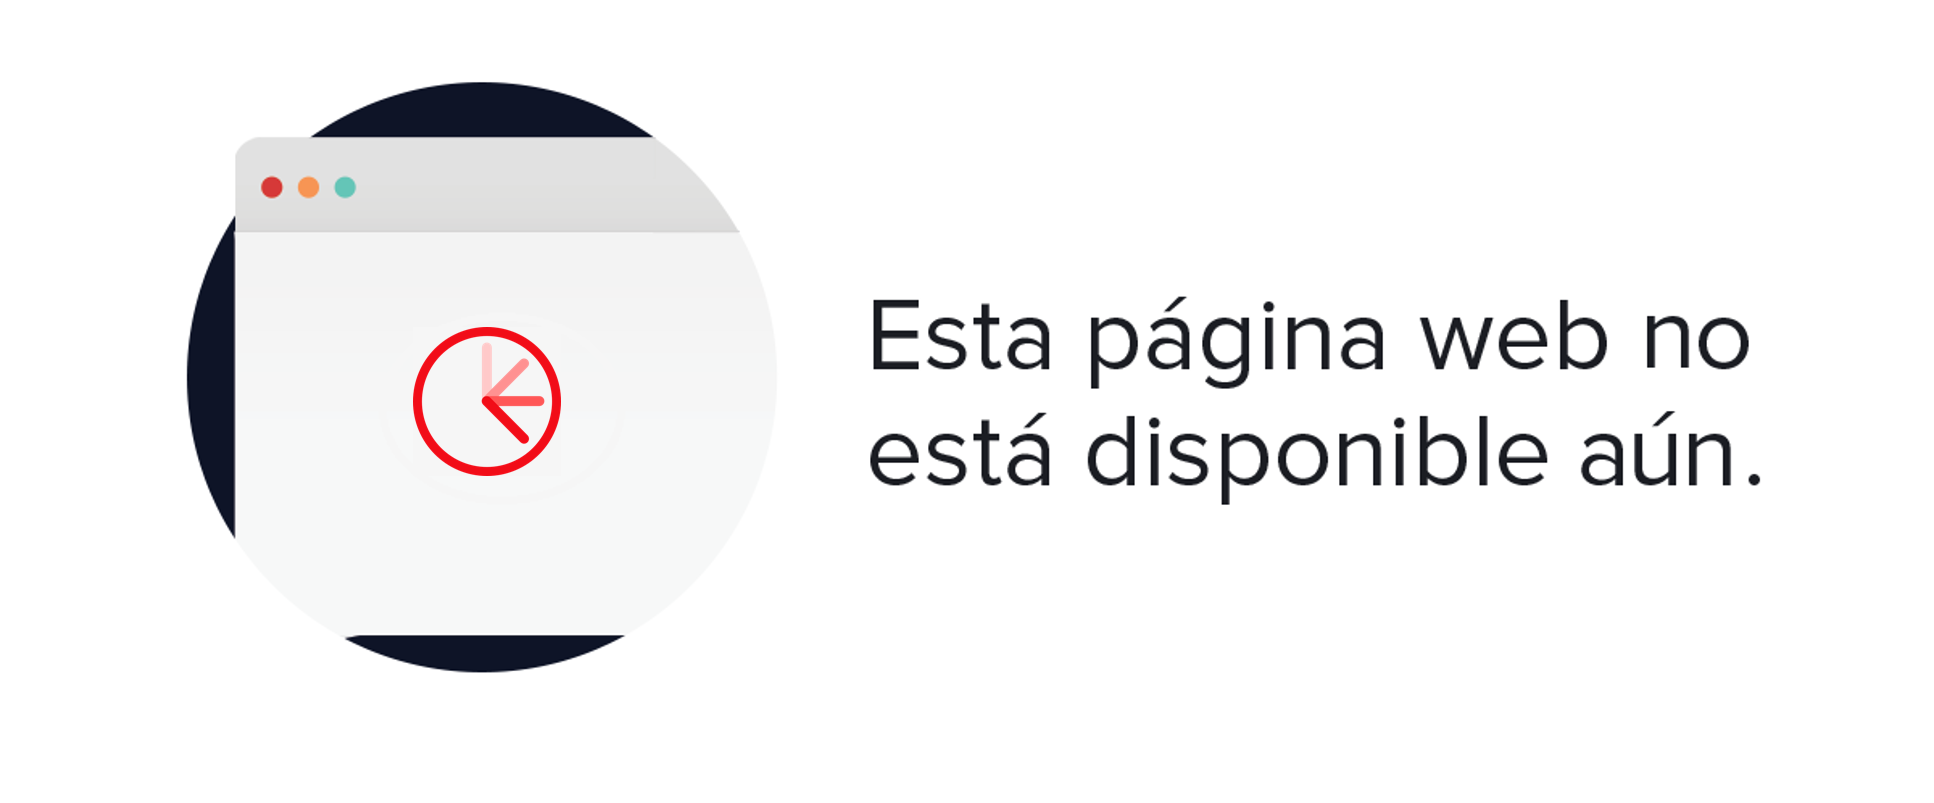 Adolfo Dominguez - Pantalón de mujer Adolfo Dominguez recto azul Azul marino 8433917477443 - UNNCHKY